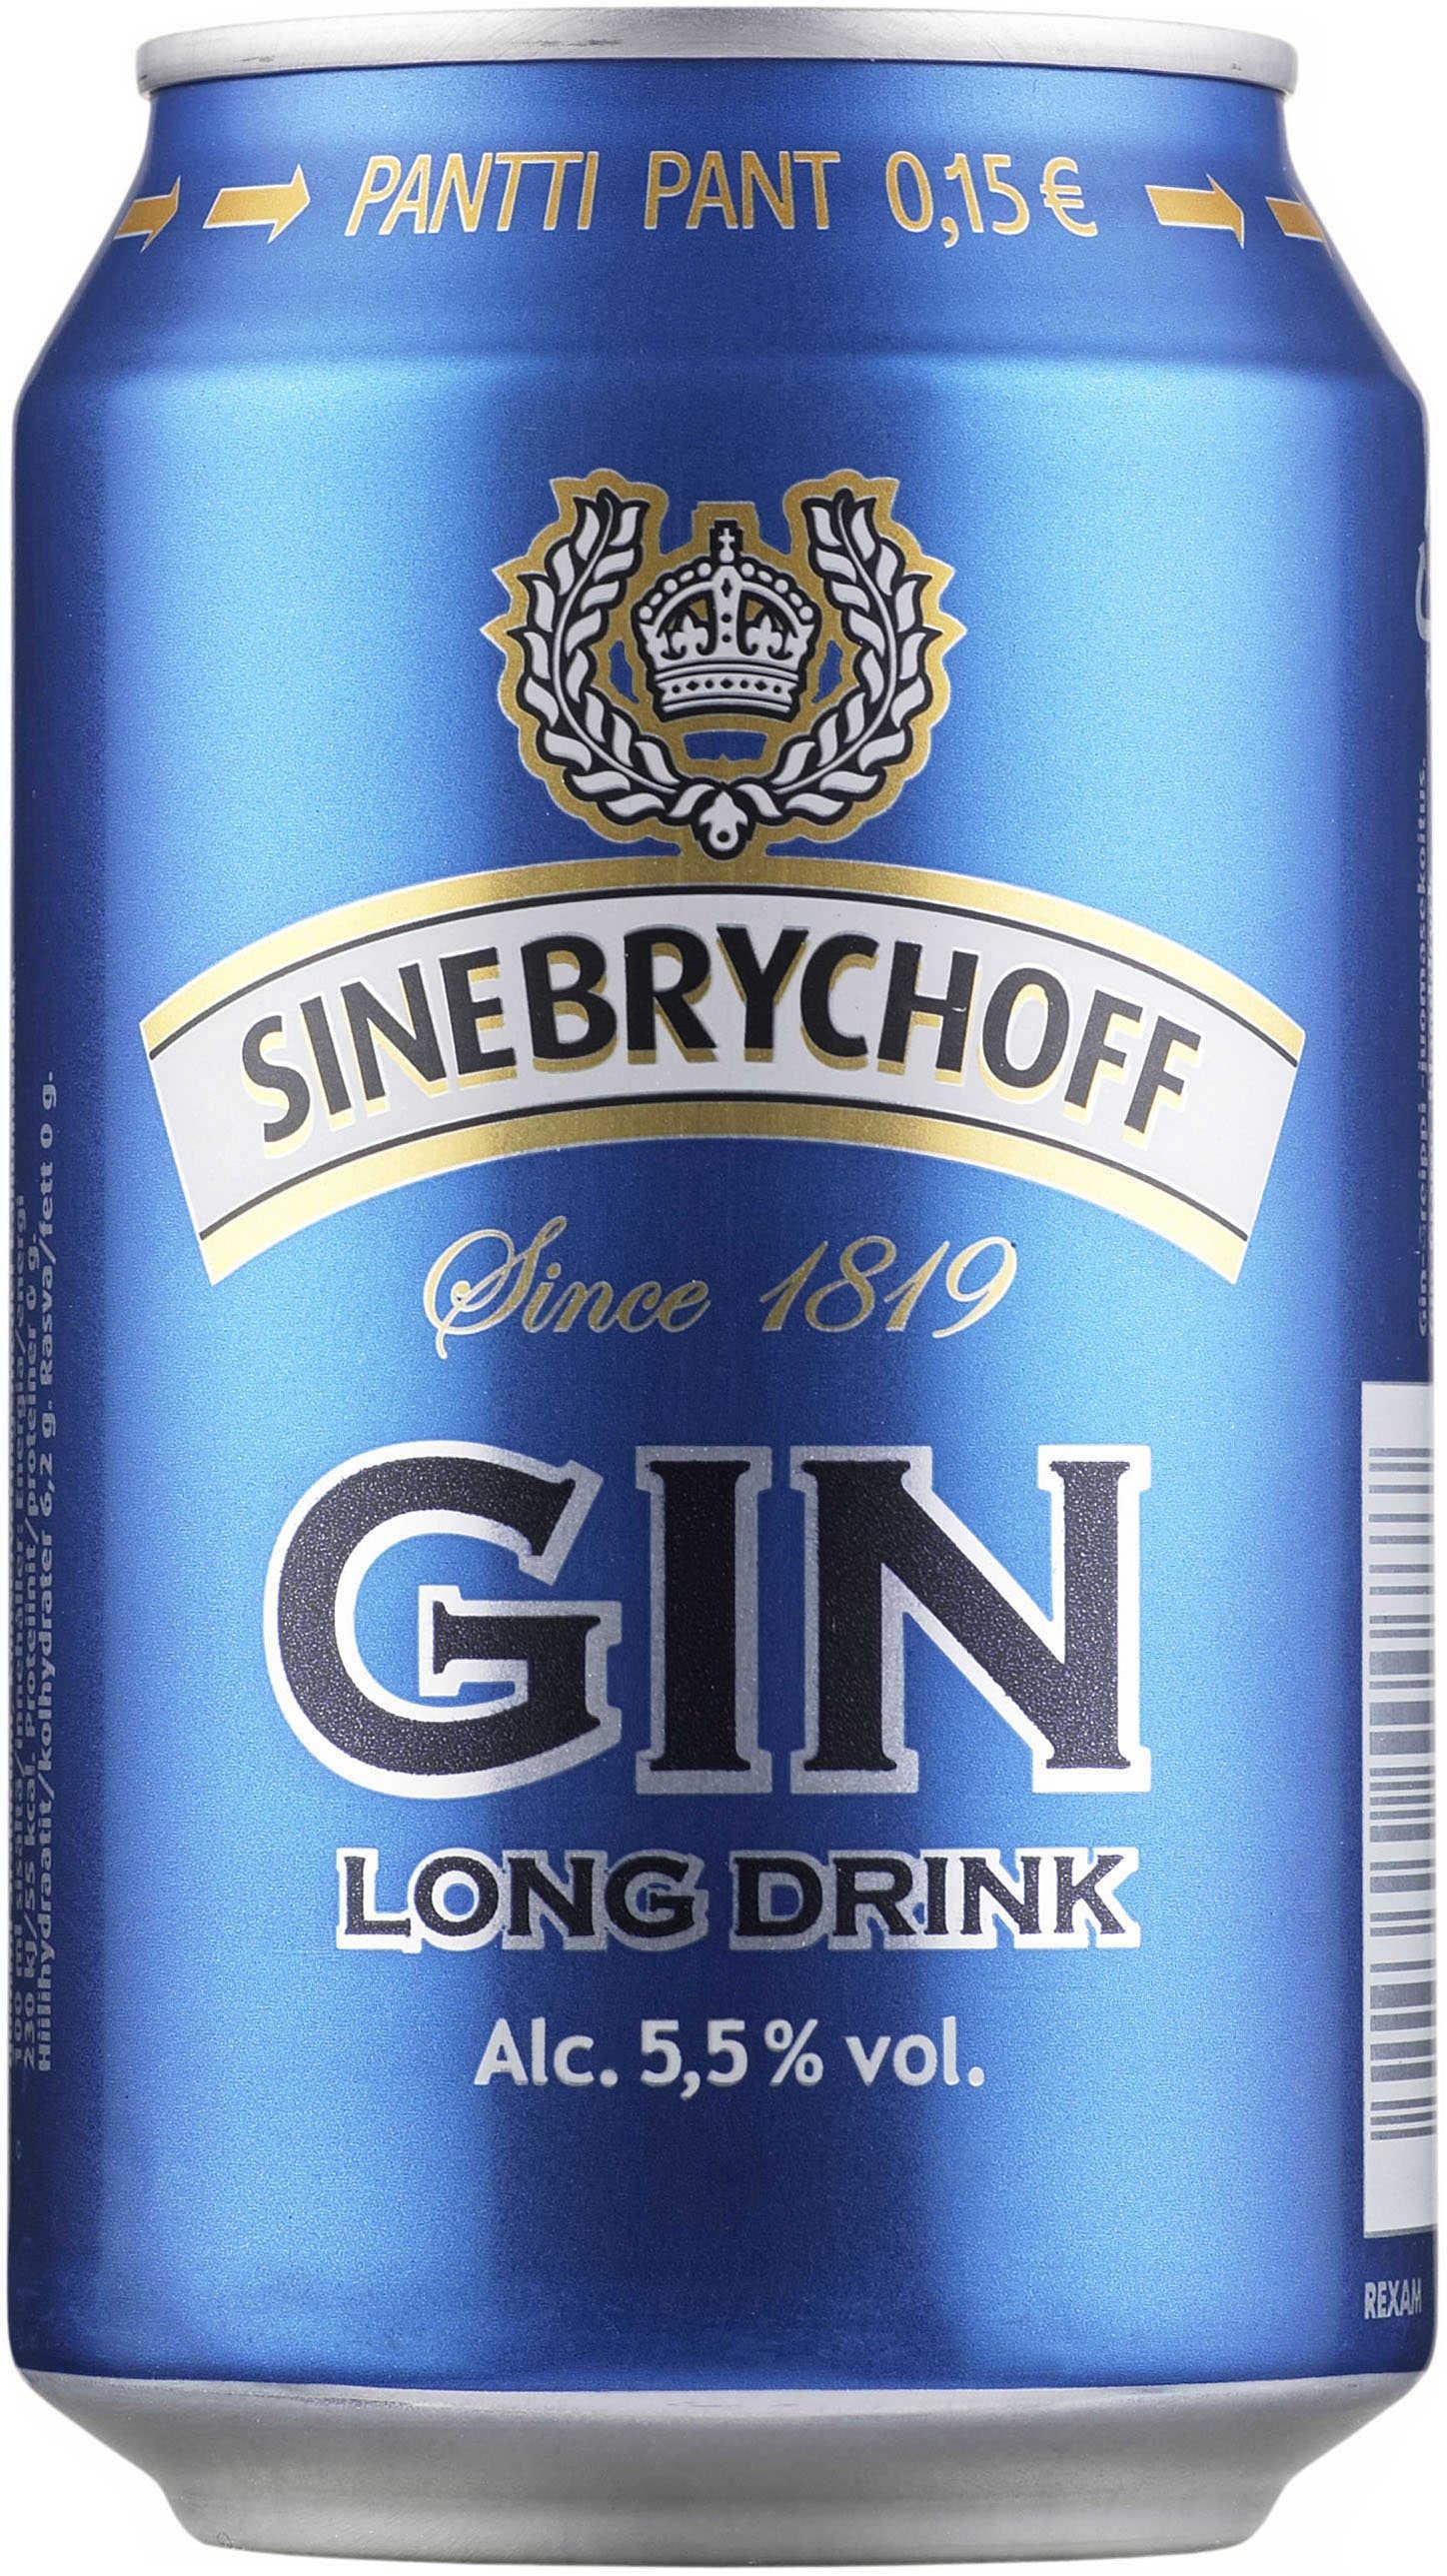 sinebrychoff gin long drink l long drinkit